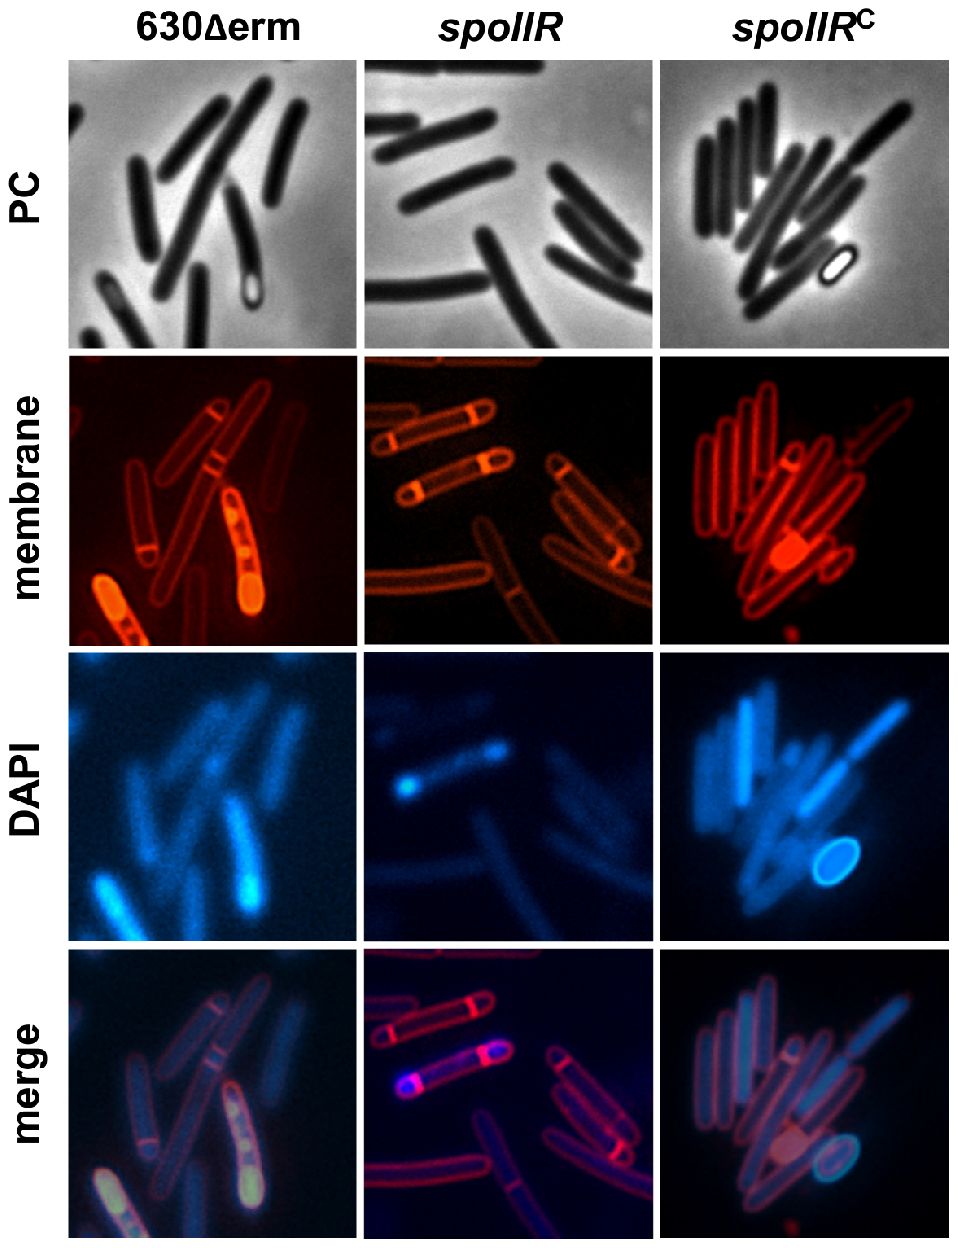 Morphological characterization of a <i>spoIIR</i> mutant.